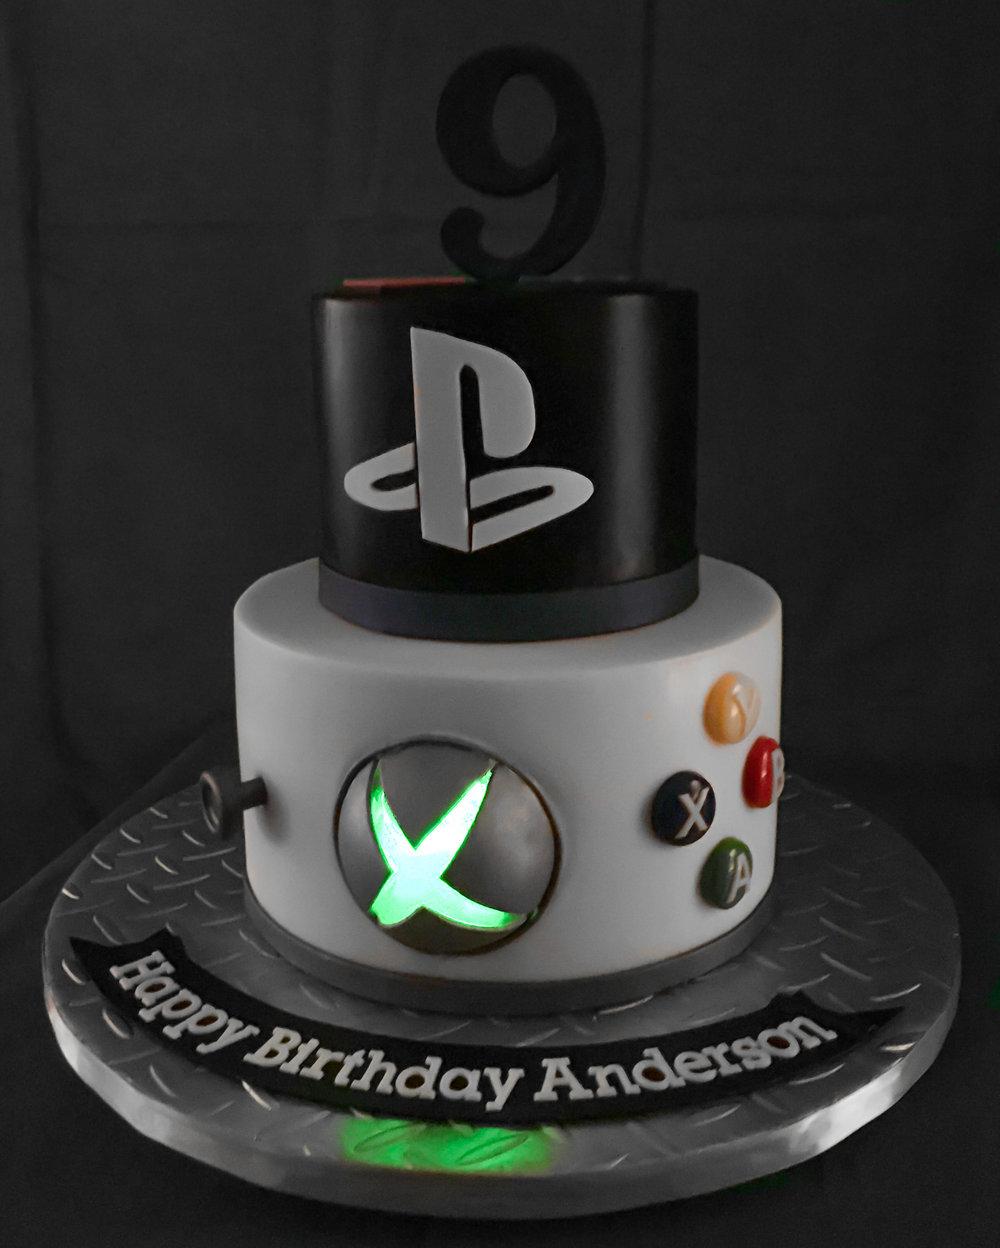 Birthday Cakes The Cake Fairy